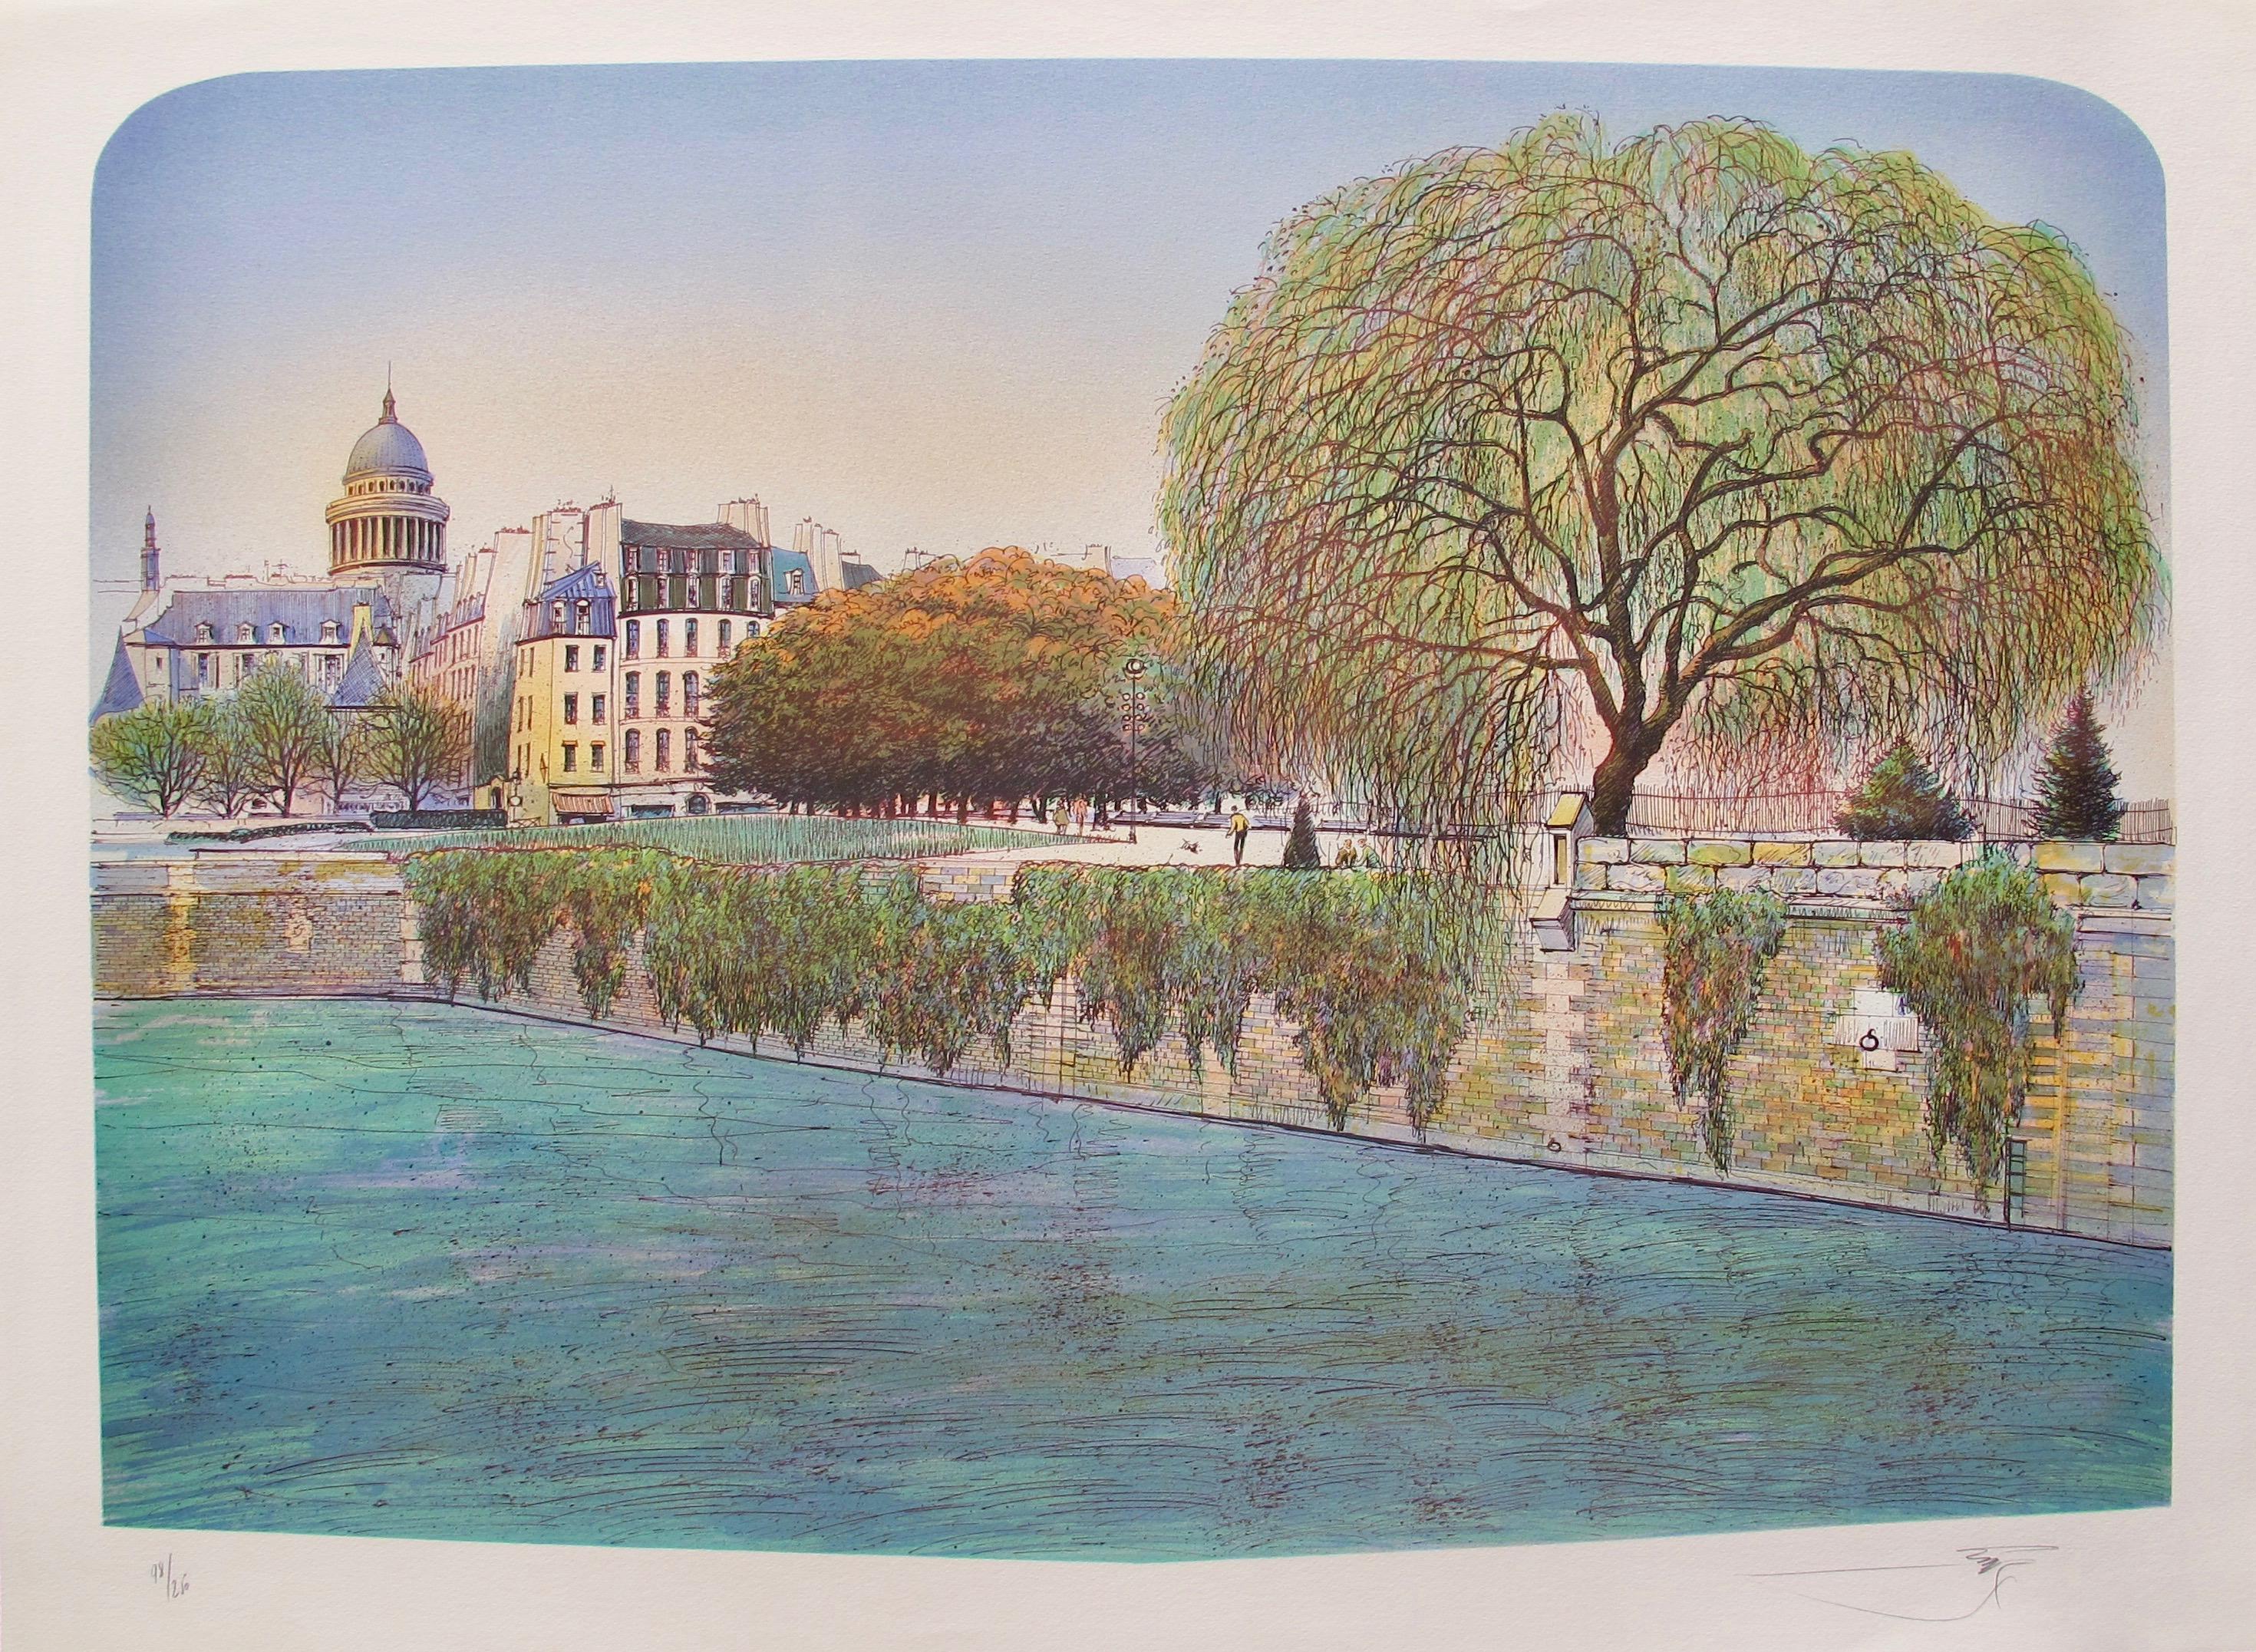 ROLF RAFFLEWSKI Paris LA SEINE SPRING Hand Signed Limited Edition Lithograph